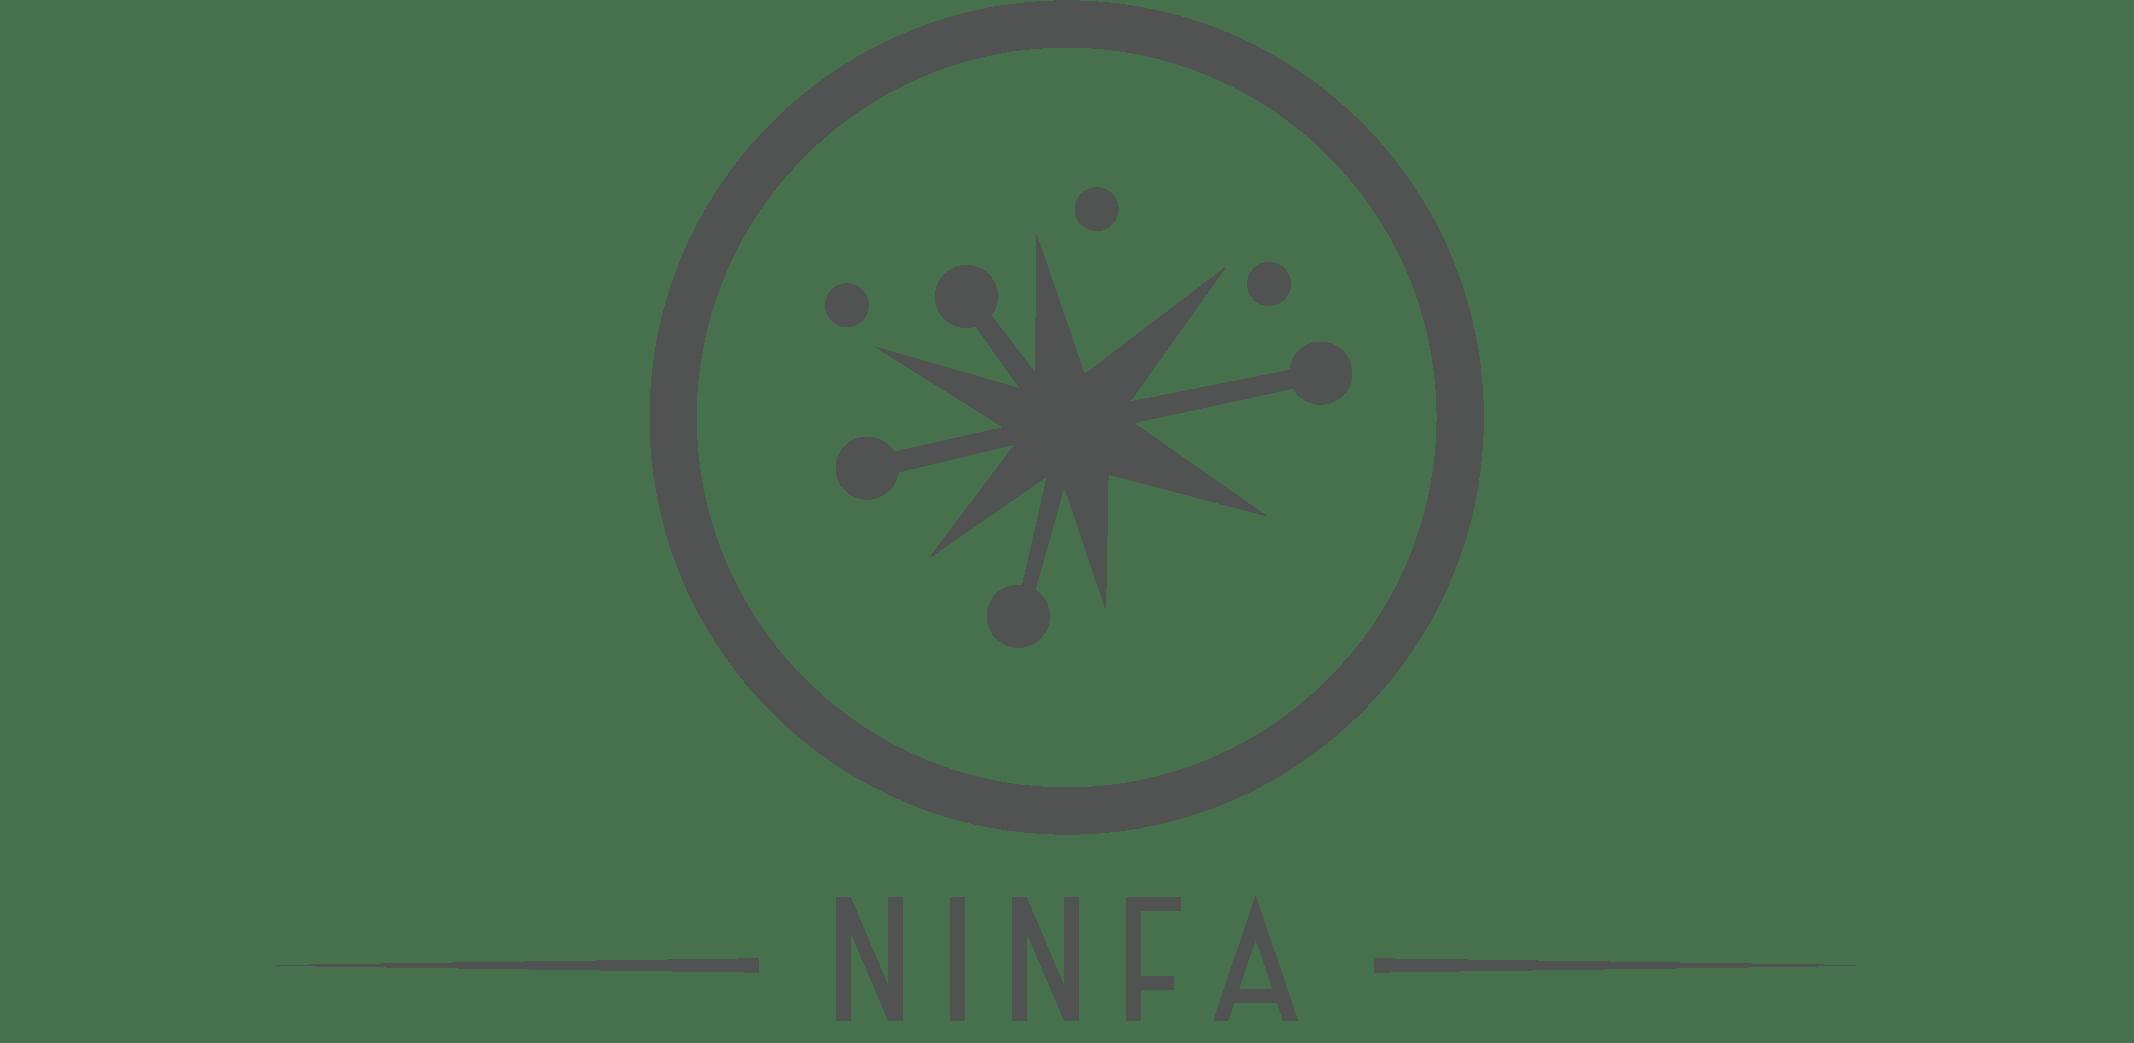 Ninfa brand logo